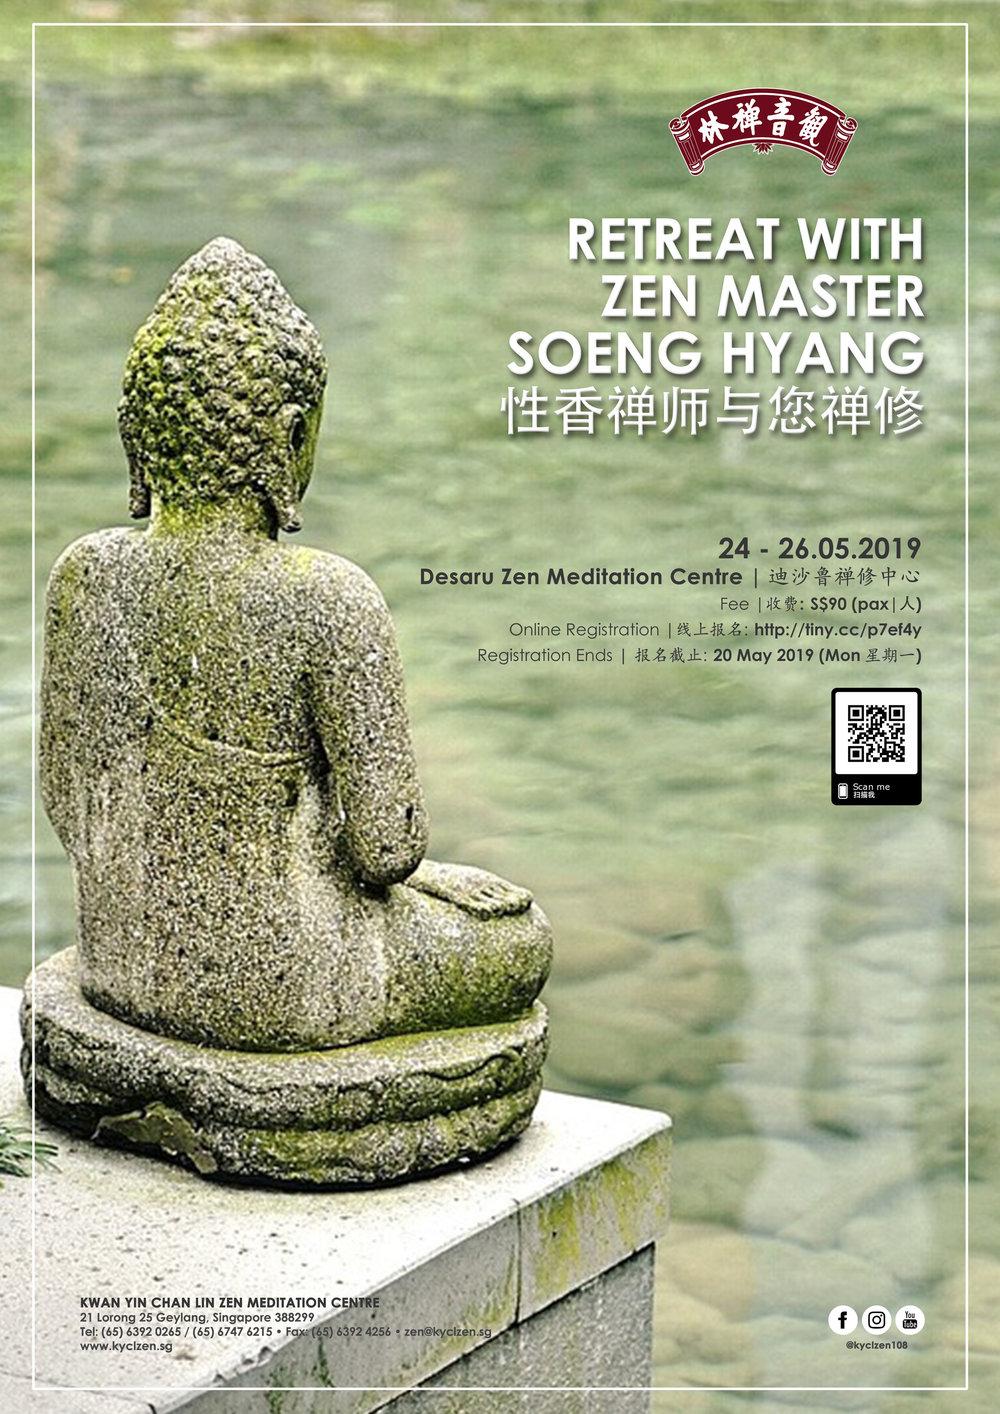 3-Day Retreat with Zen Master Soeng Hyang.jpg